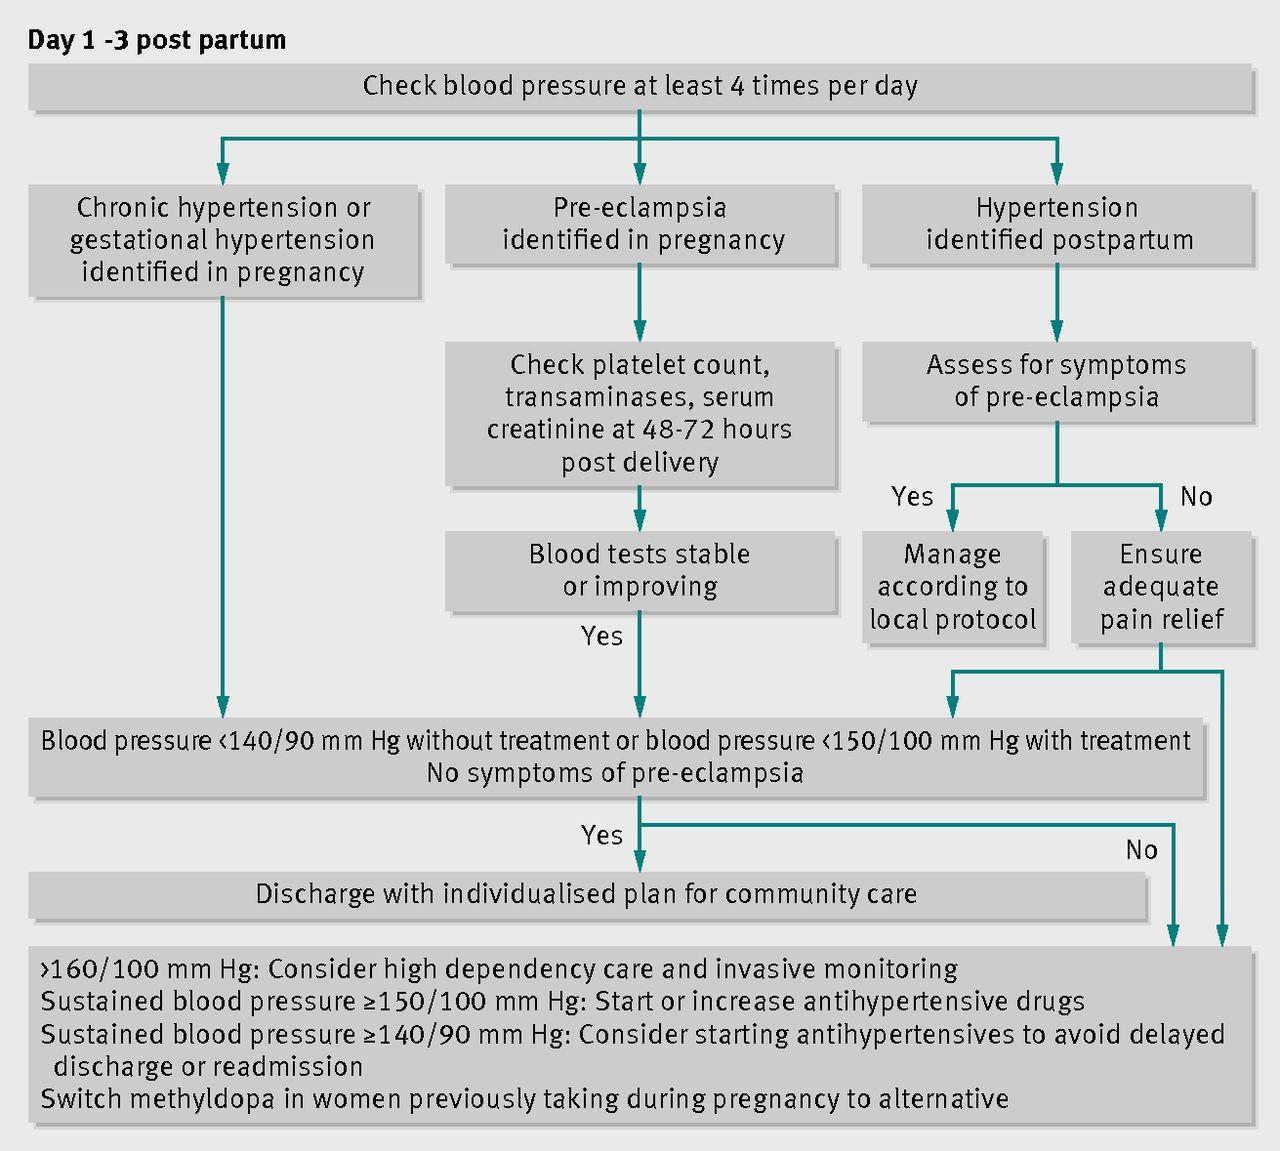 Postpartum management of hypertension | The BMJ